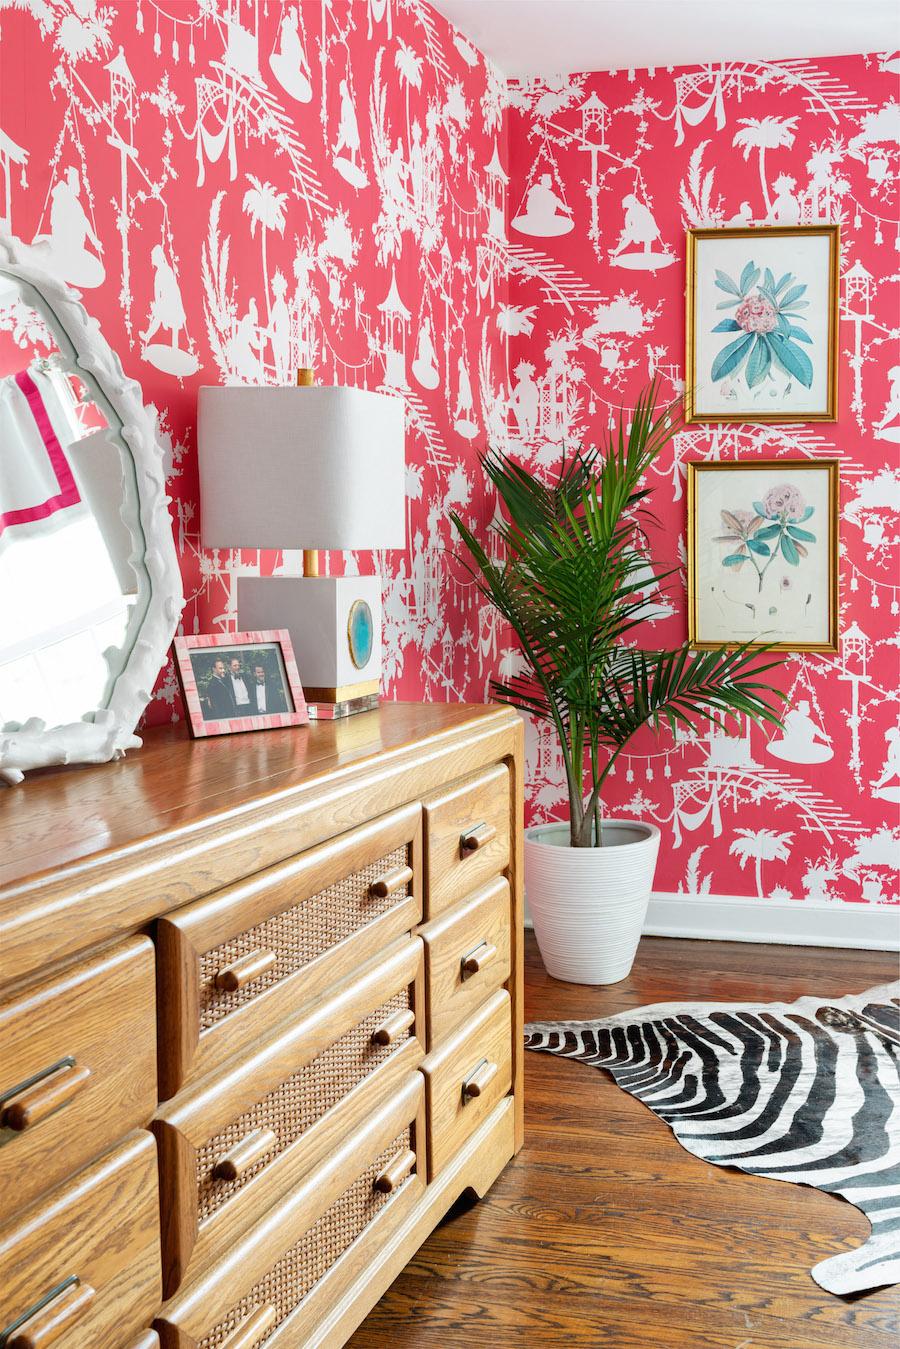 Happy Home Tour! Meredith's Vibrant Retreat – Jill Sorensen Best Children's Lighting & Home Decor Online Store